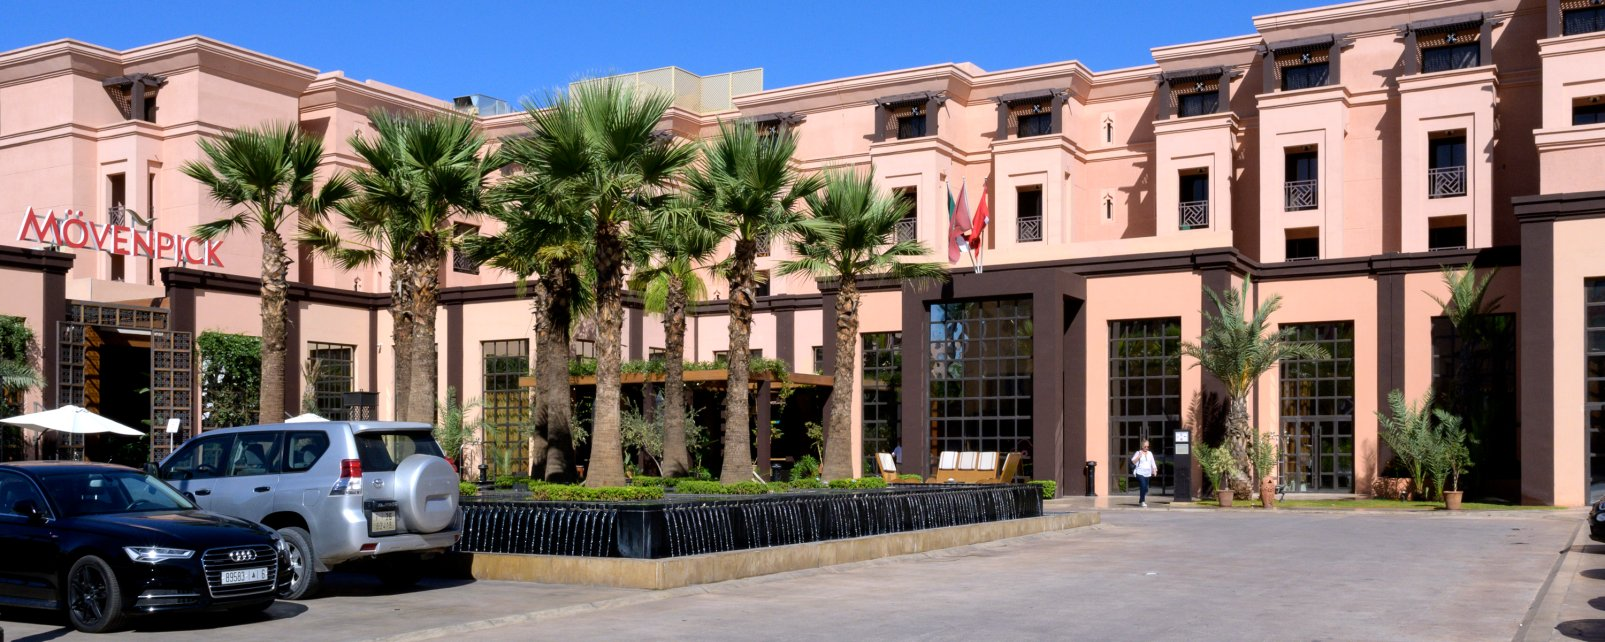 Hôtel Movempick Mansour Eddahbi